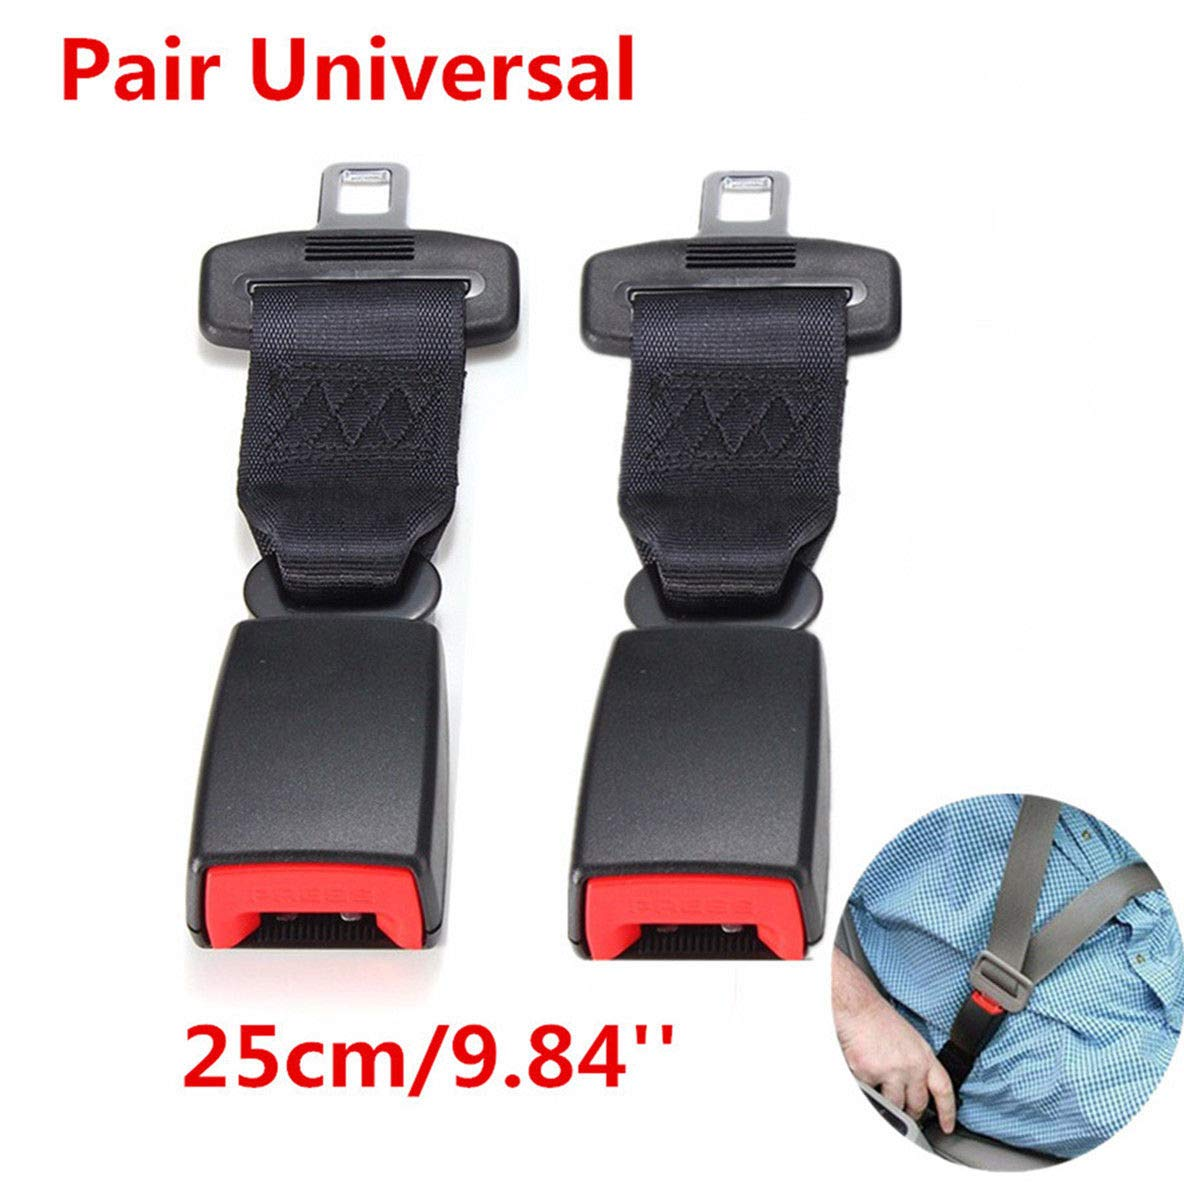 FidgetFidget Seat Belt 2PCS 25cm/9.84'' Car Extenders Safety Belt Extension Buckles Universal